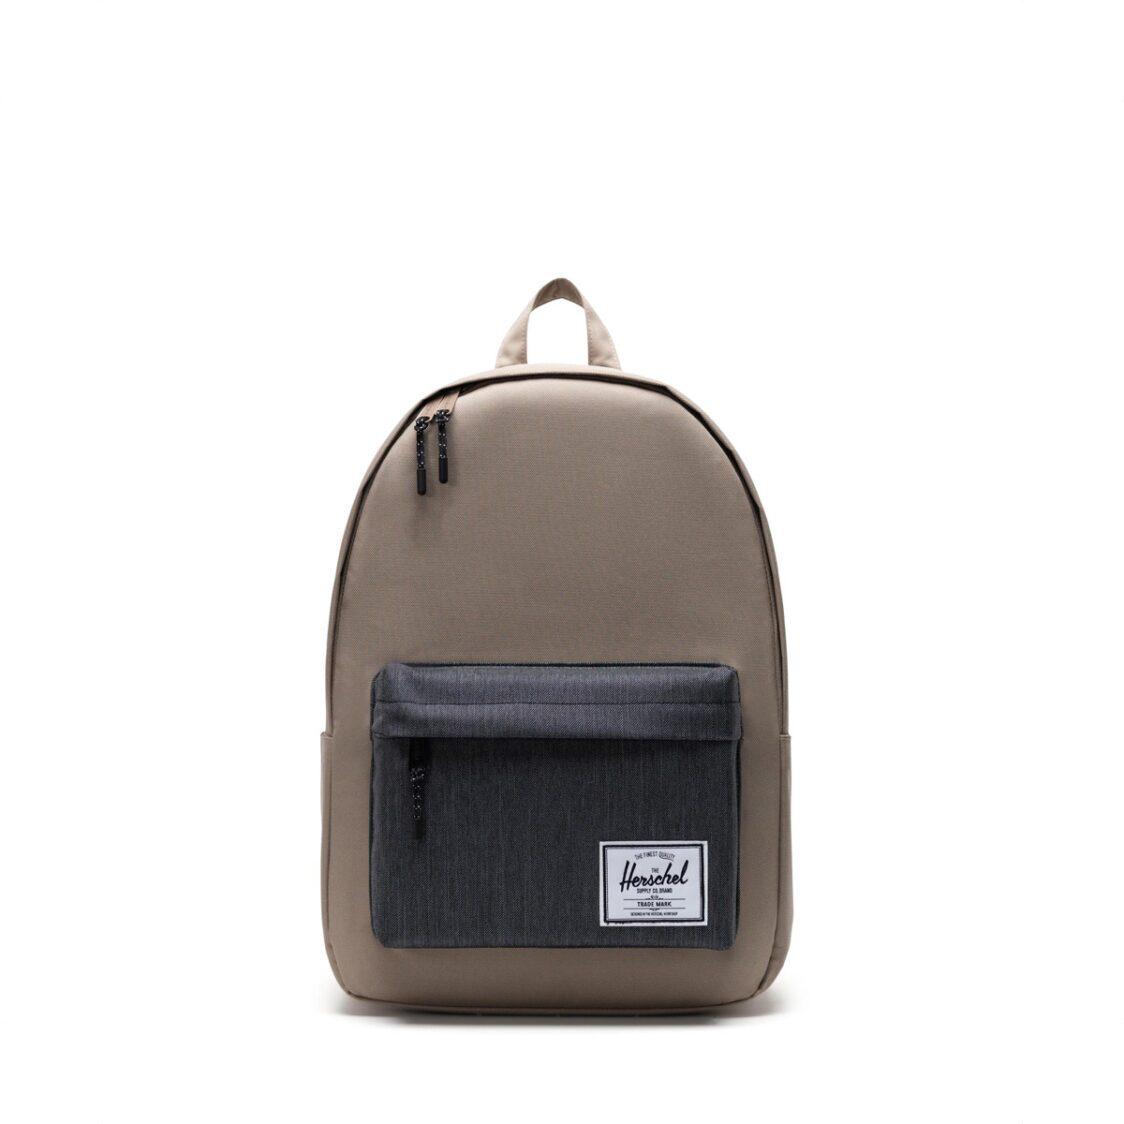 Herschel Classic X-Large - TimberwolfBlack Denim Backpack 10492-04514-OS